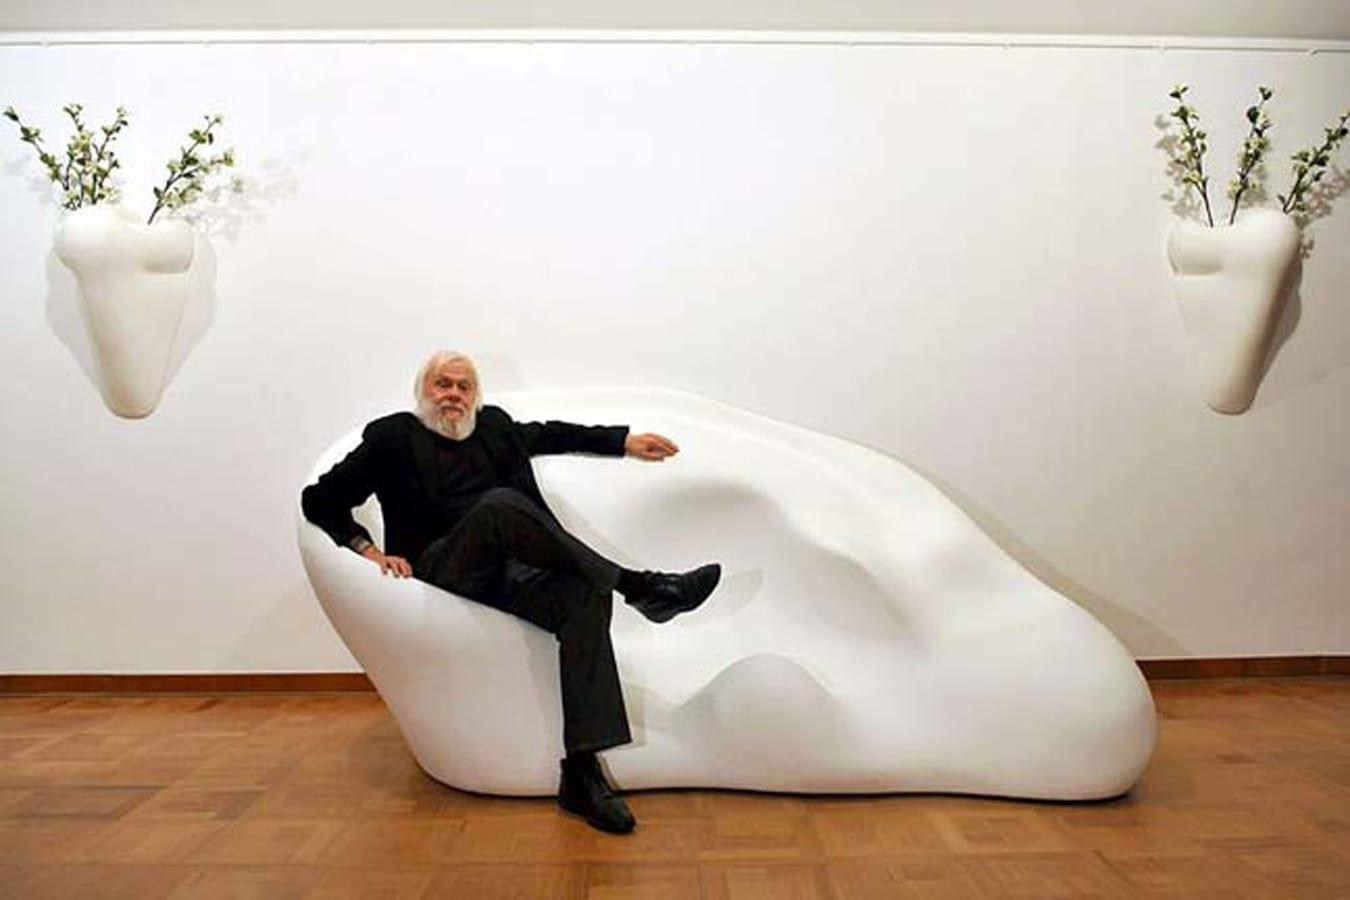 John Baldessari sitting on a sculptural form